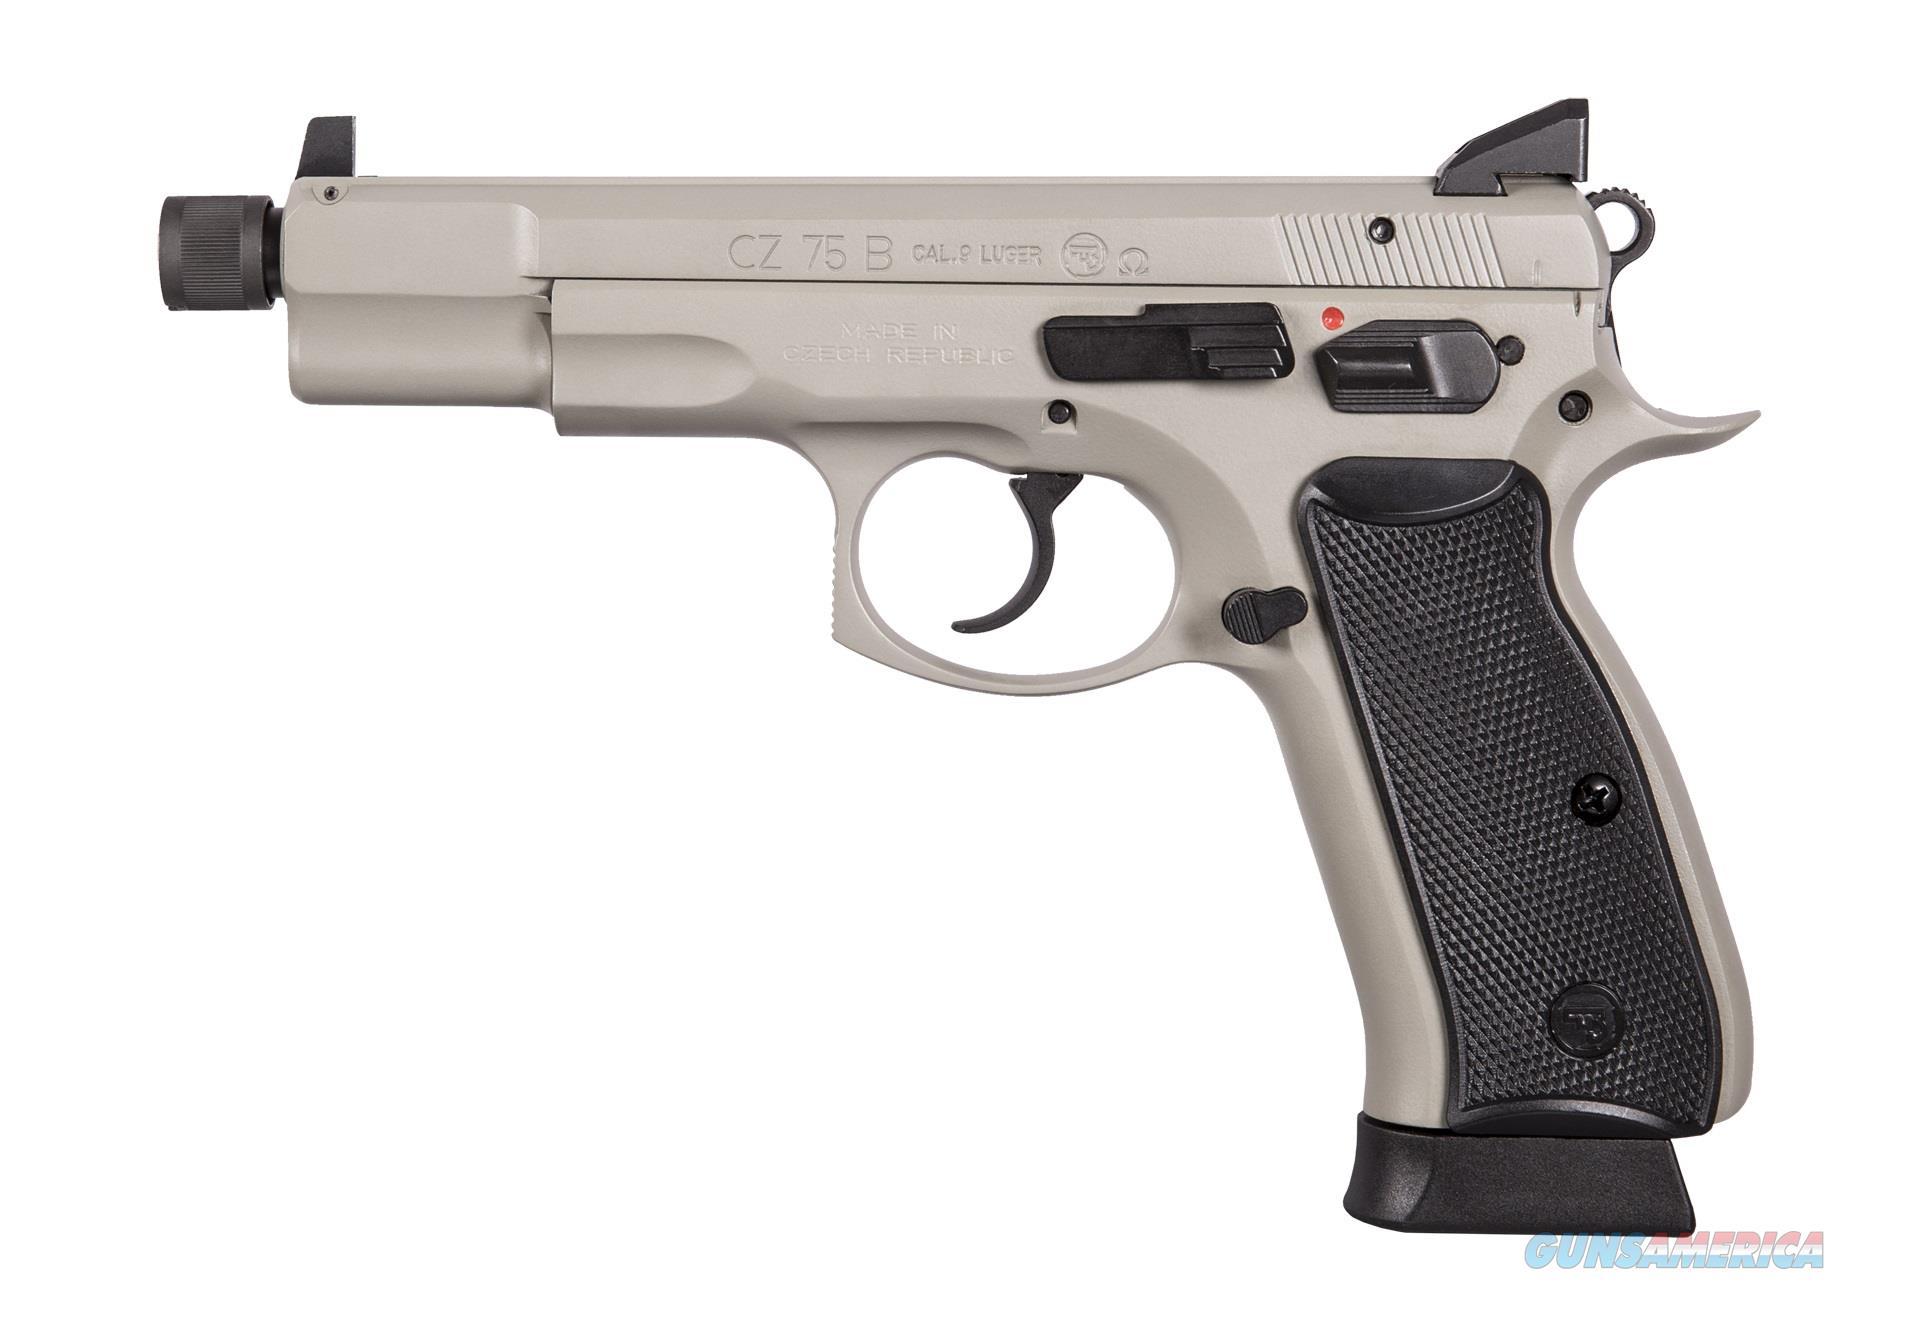 "CZ-USA CZ 75 B Urban Grey 9mm Omega 5.21"" Suppressor Ready 91235   Guns > Pistols > CZ Pistols"